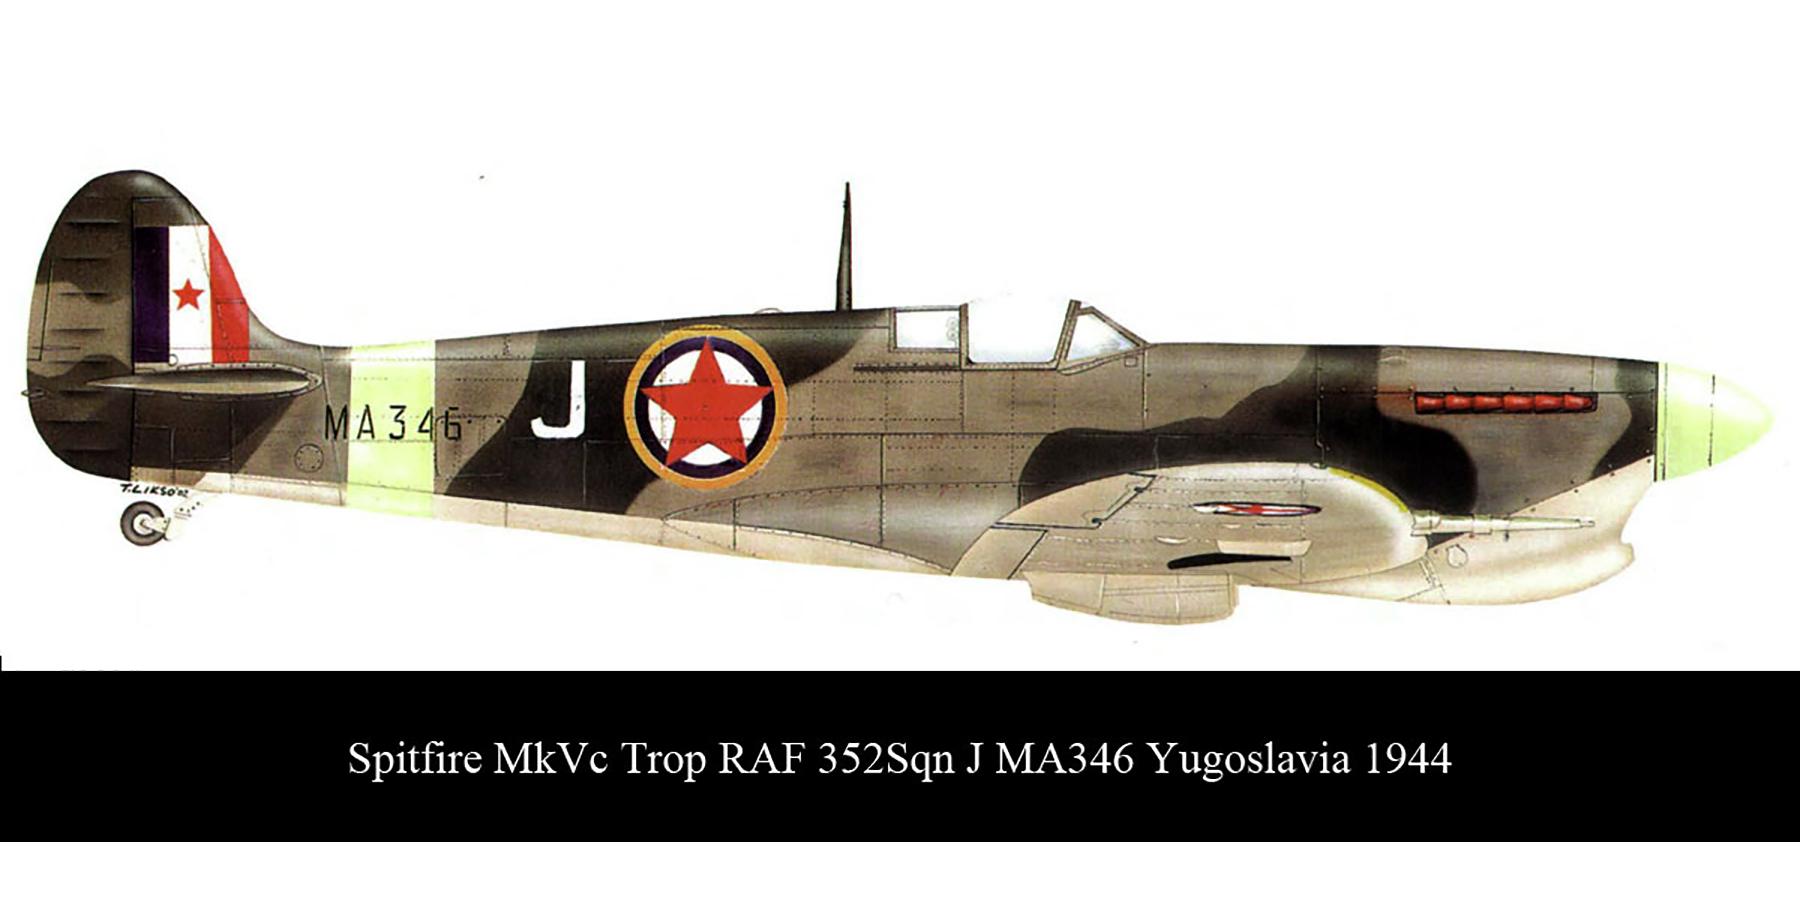 Spitfire MkVcTrop RAF 352Sqn J MA346 Yugoslavia Mar 1945 00